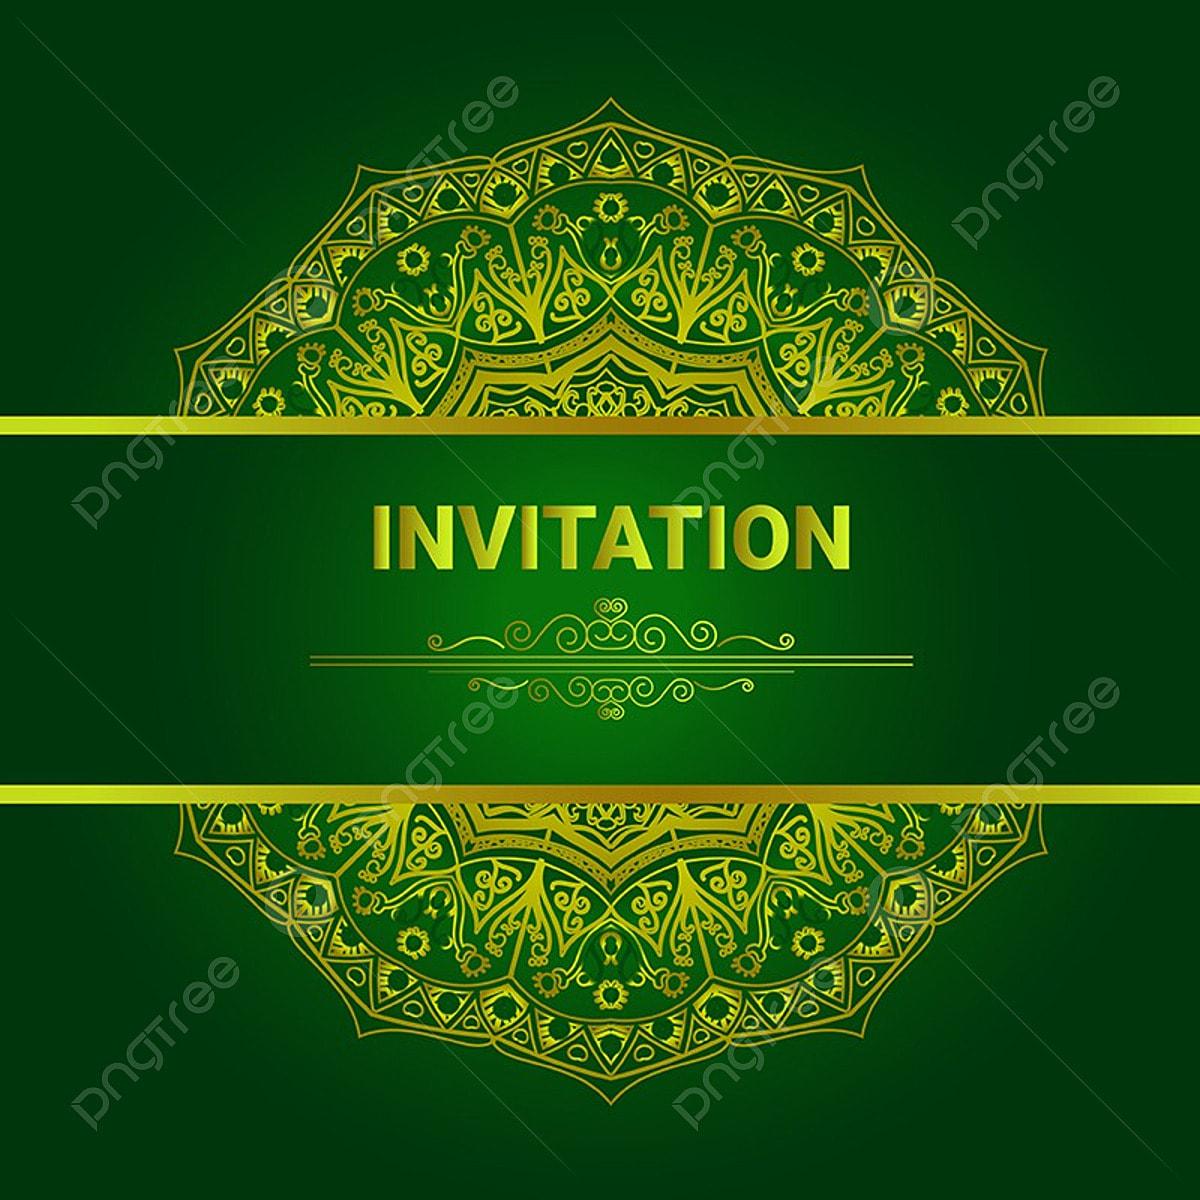 Invitation Card With Mandala Background 02 Mandala Green